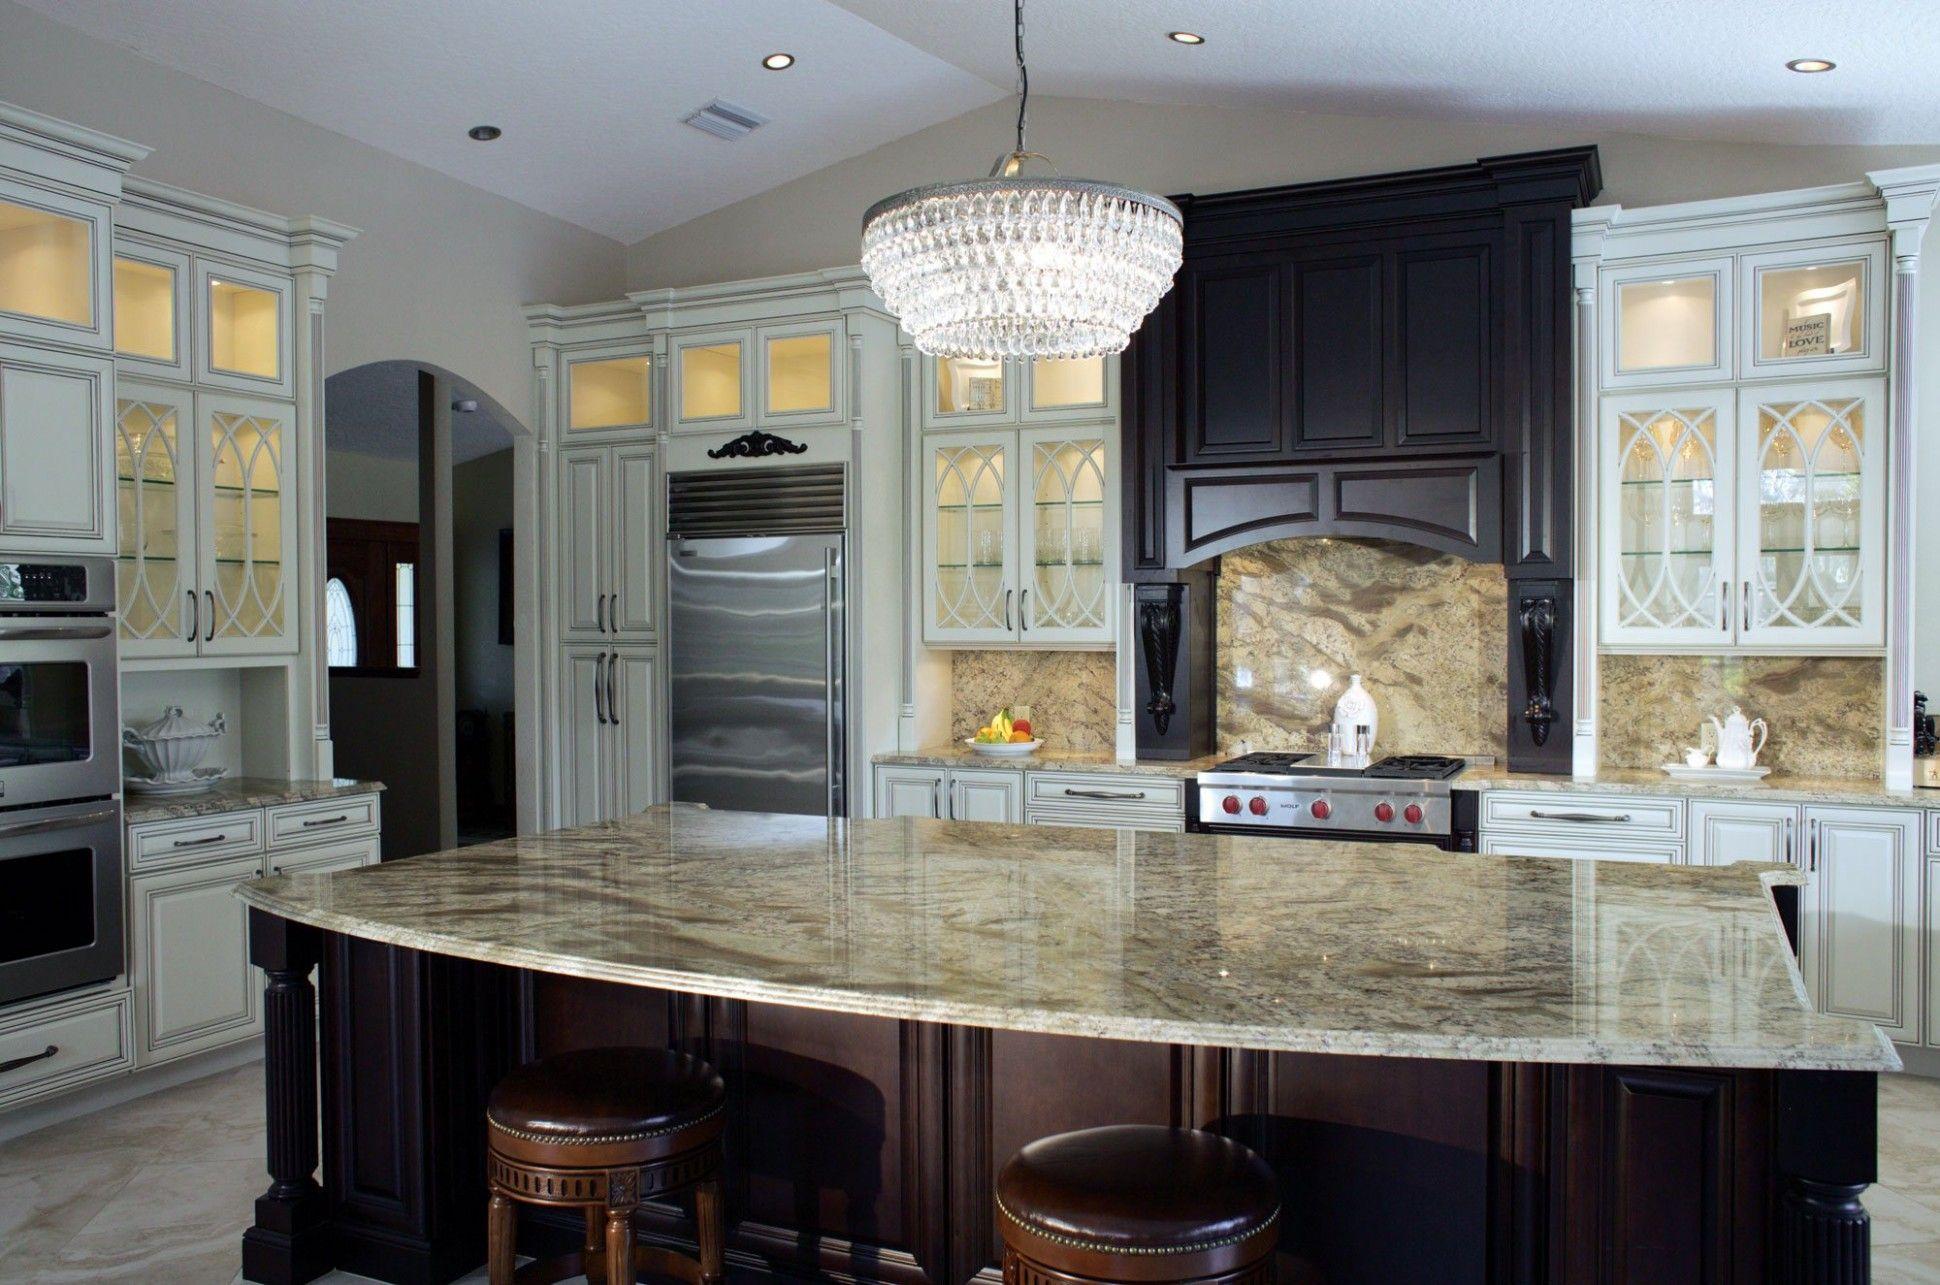 Kitchen Remodel Melbourne Fl in 2020 | Kitchen cabinets ...